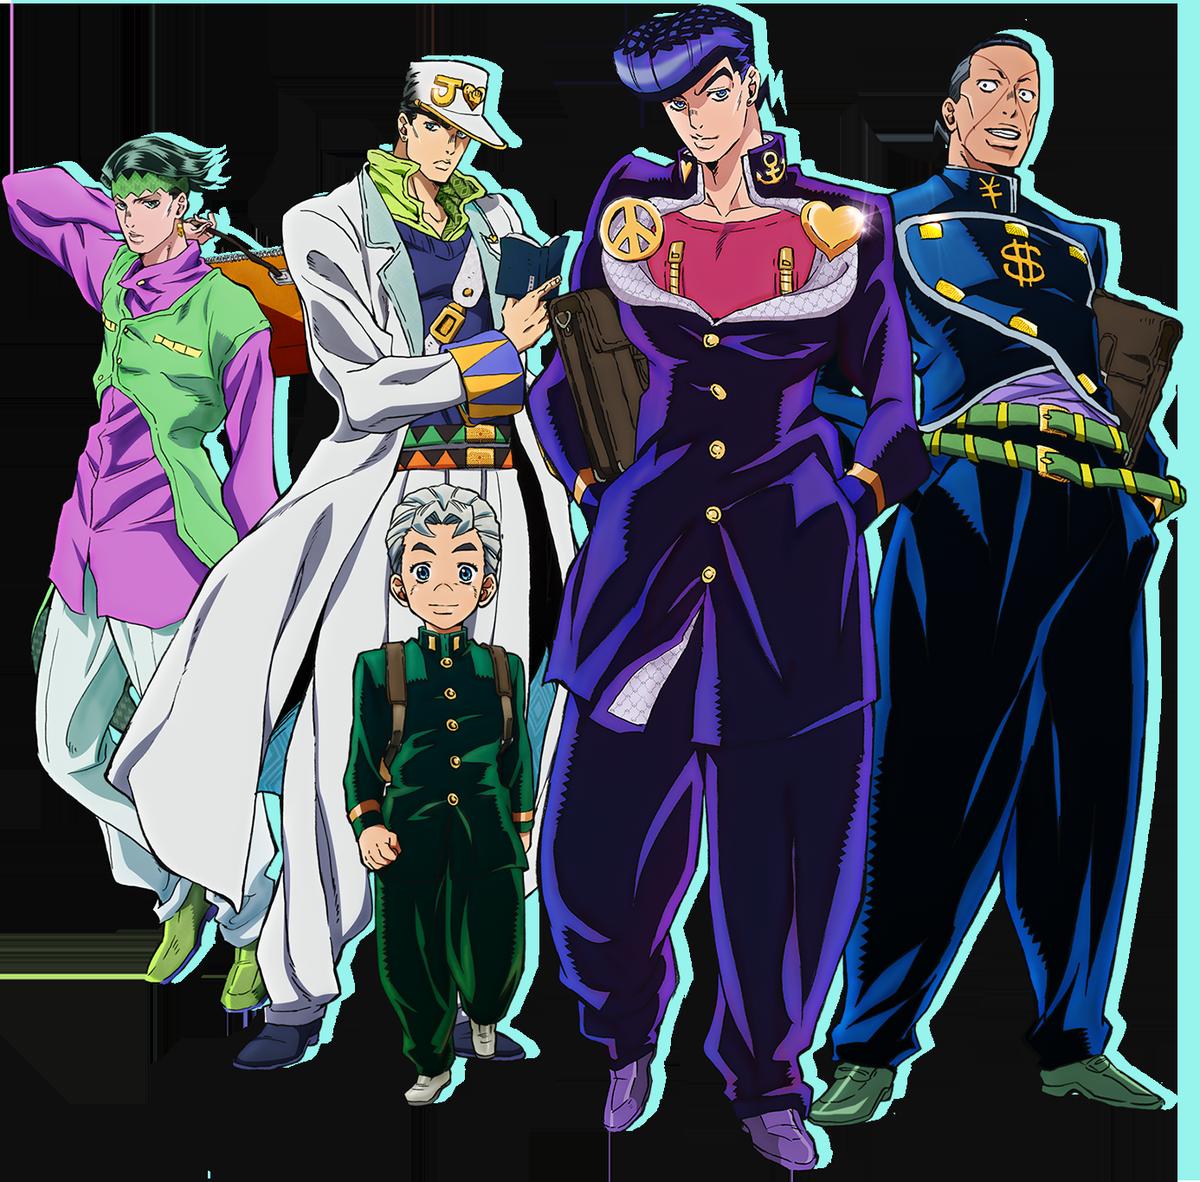 JoJo's Bizarre Adventure Part 4 TV Anime Visual